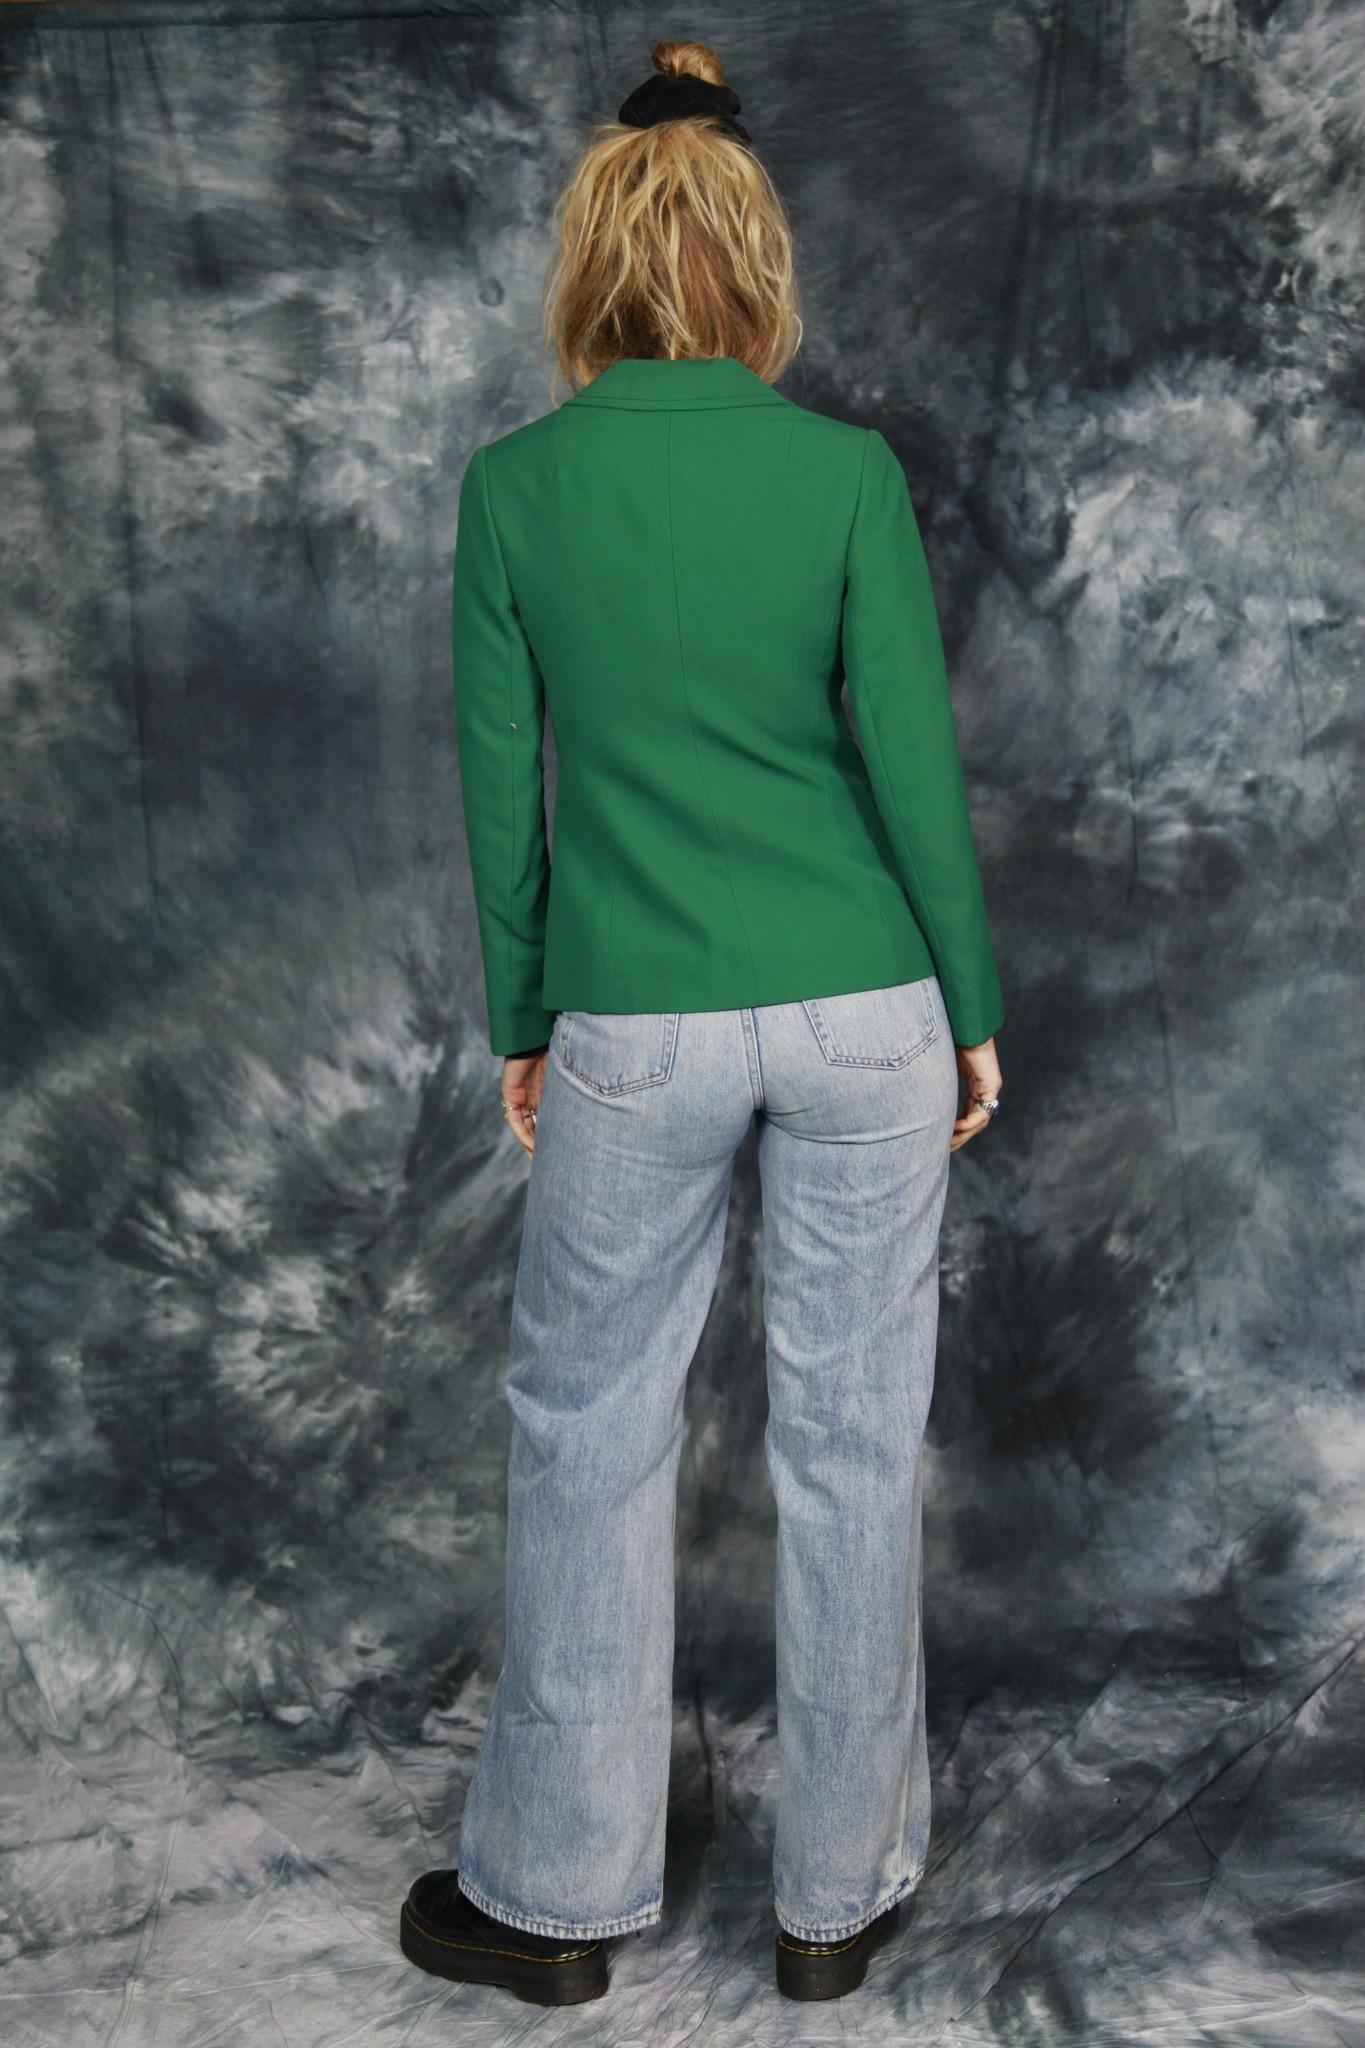 Green 70s jacket